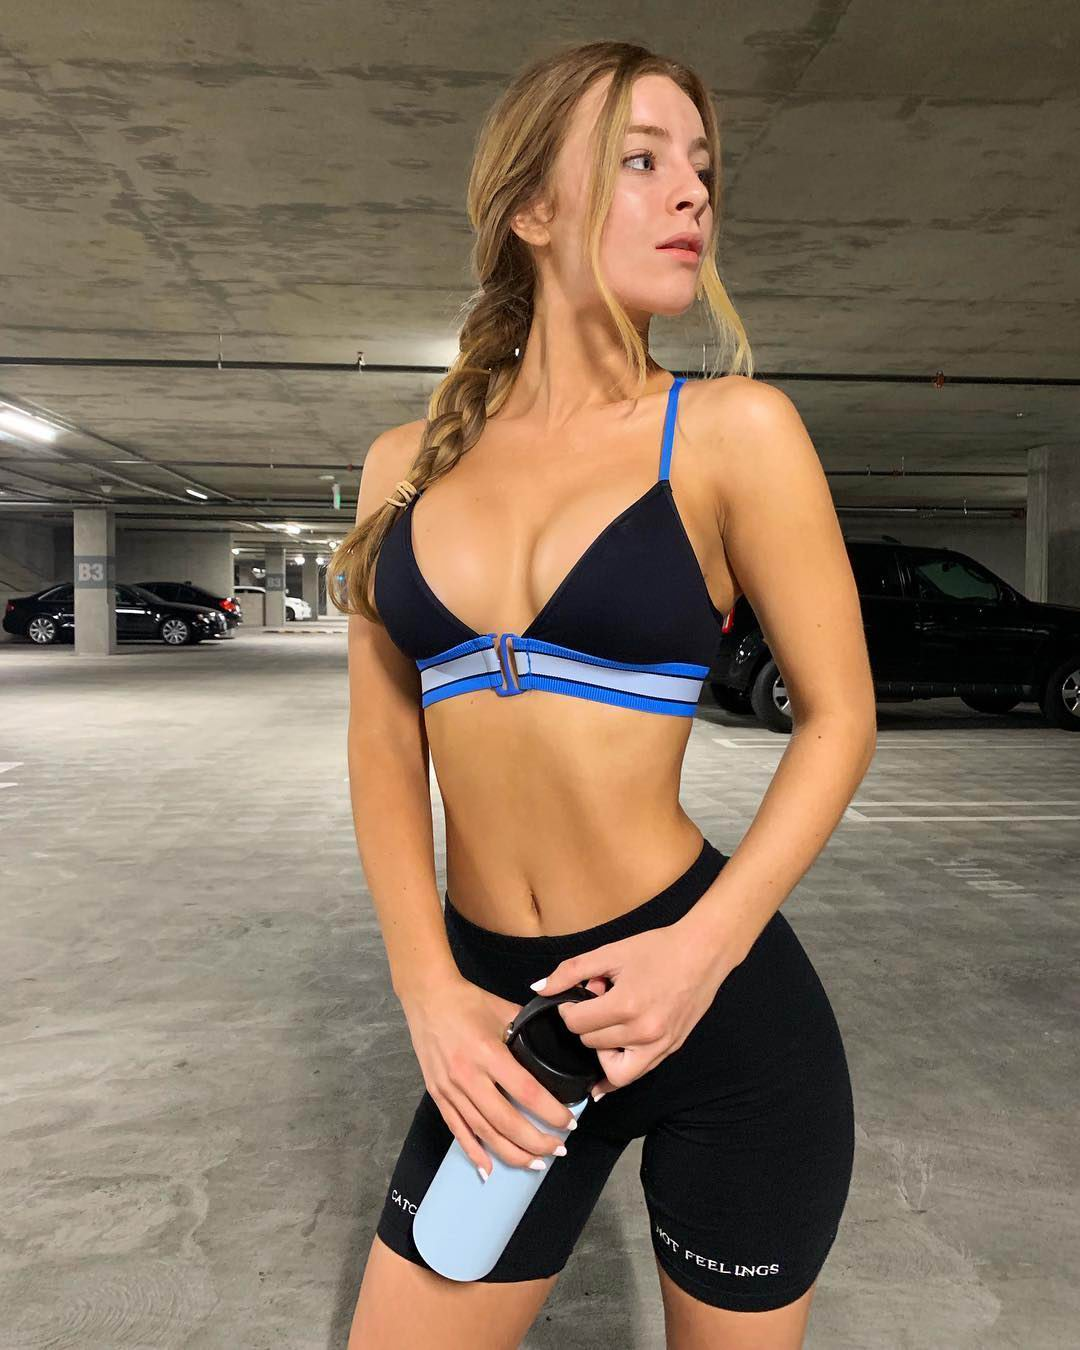 Model Ingrid